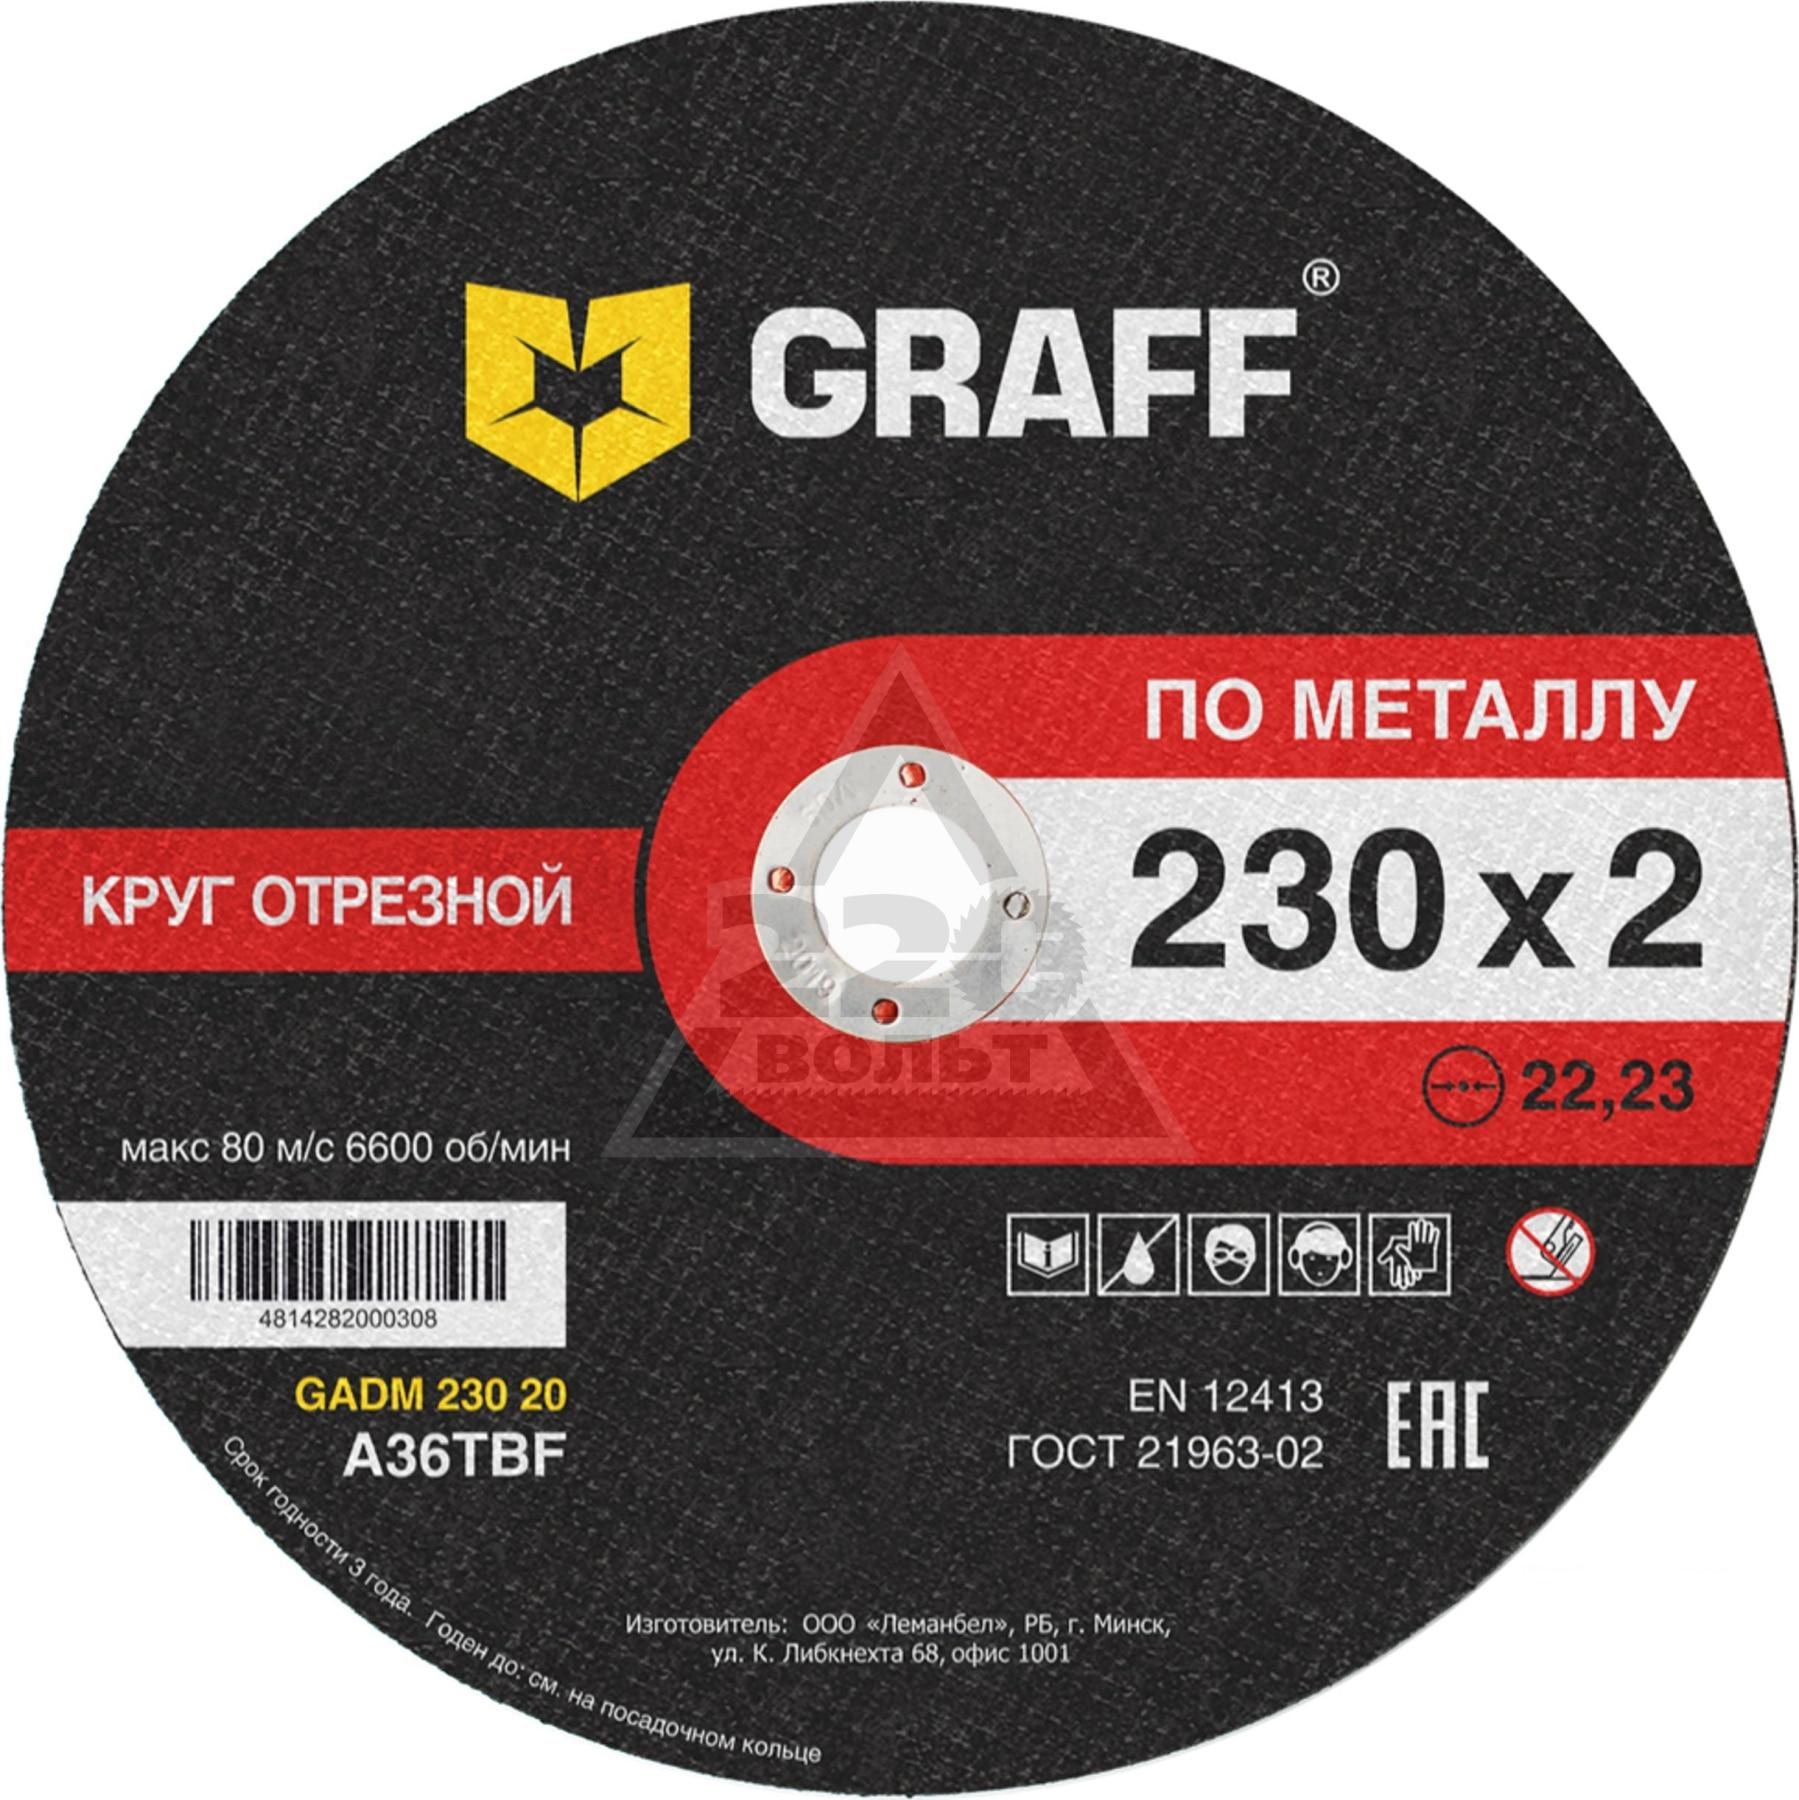 Circle Cutting GRAFF GADM 230 20